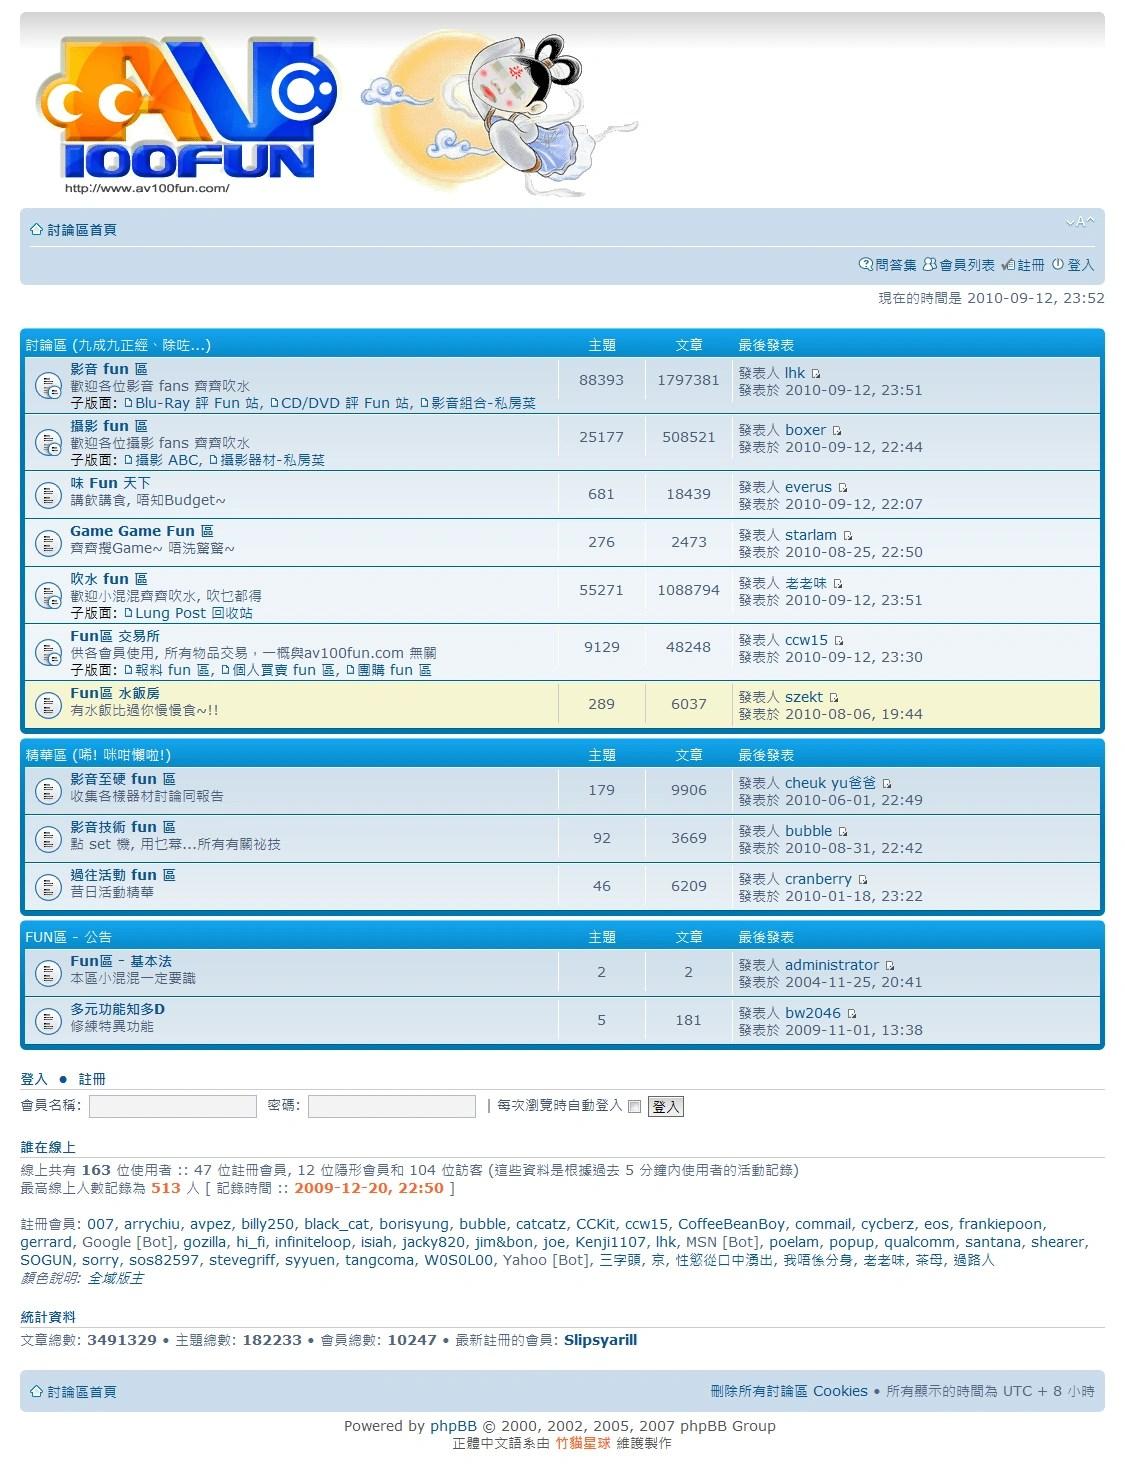 AV100Fun | 香港網絡大典 | FANDOM powered by Wikia